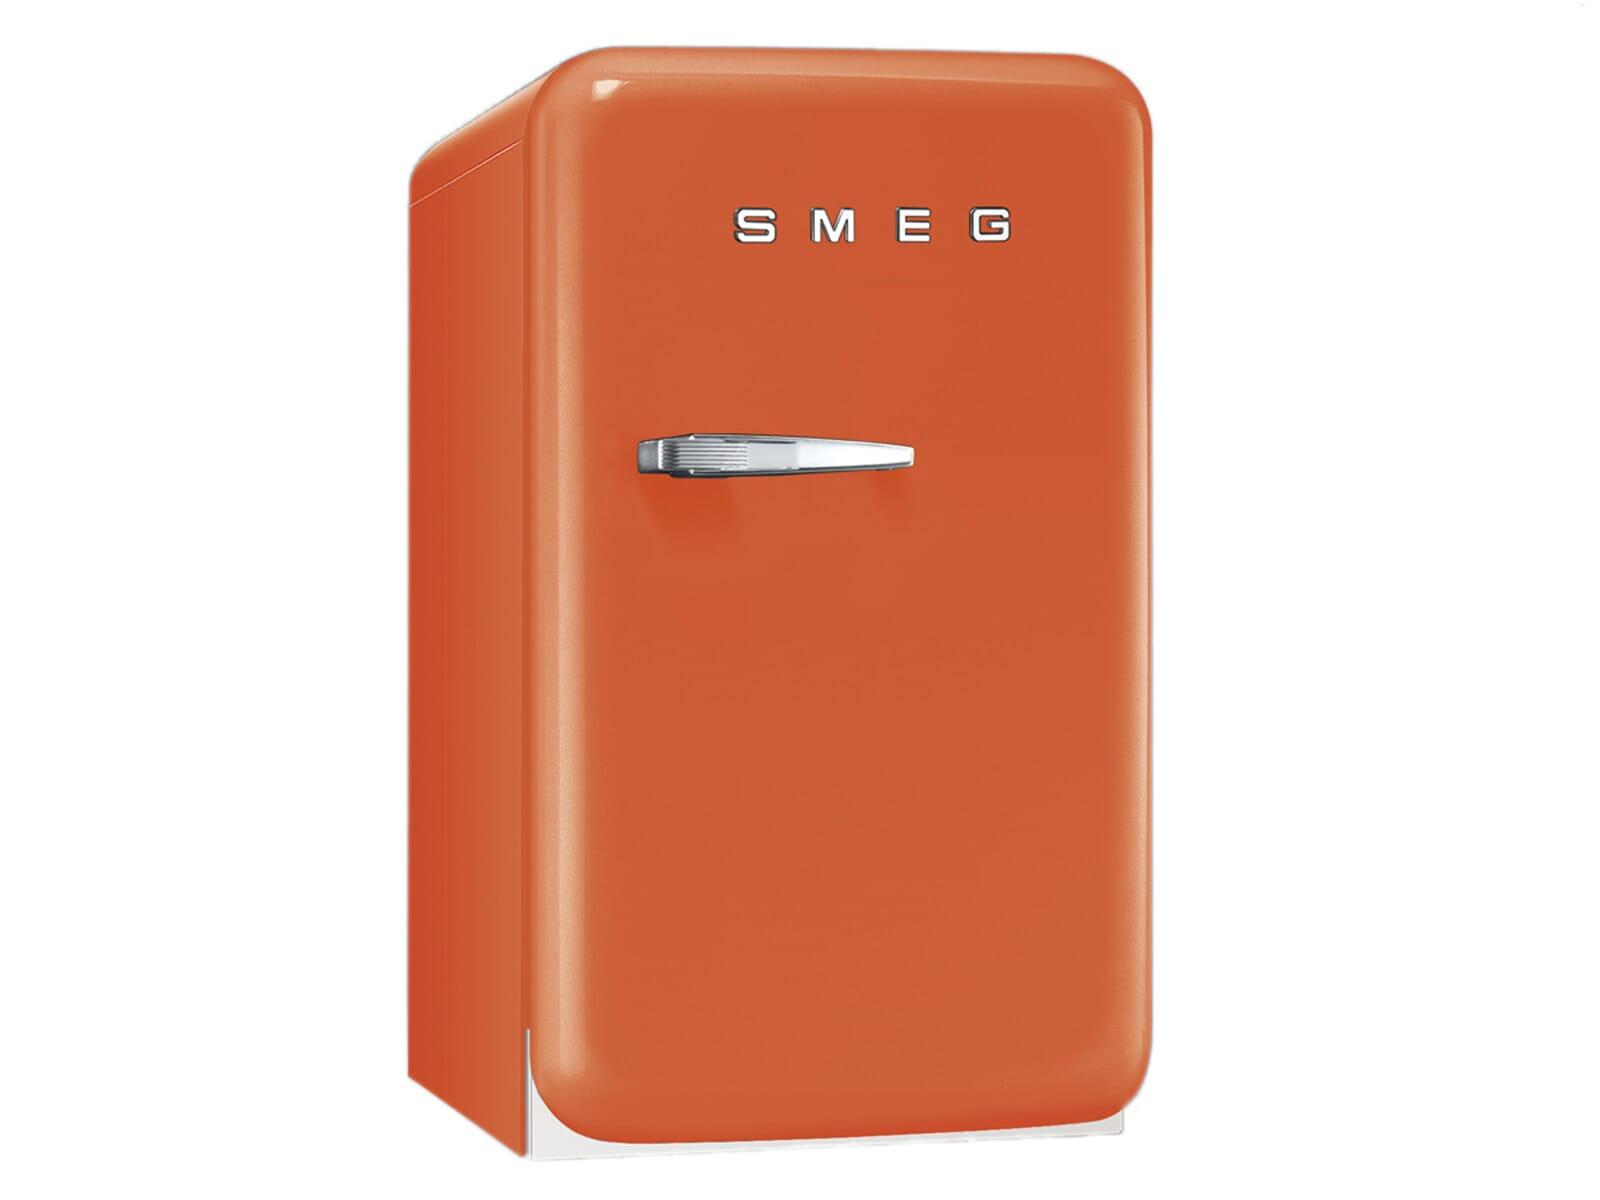 Smeg Kühlschrank Vw : Smeg kuehlschrank ch smeg kühlschrank bilder and ideen couch